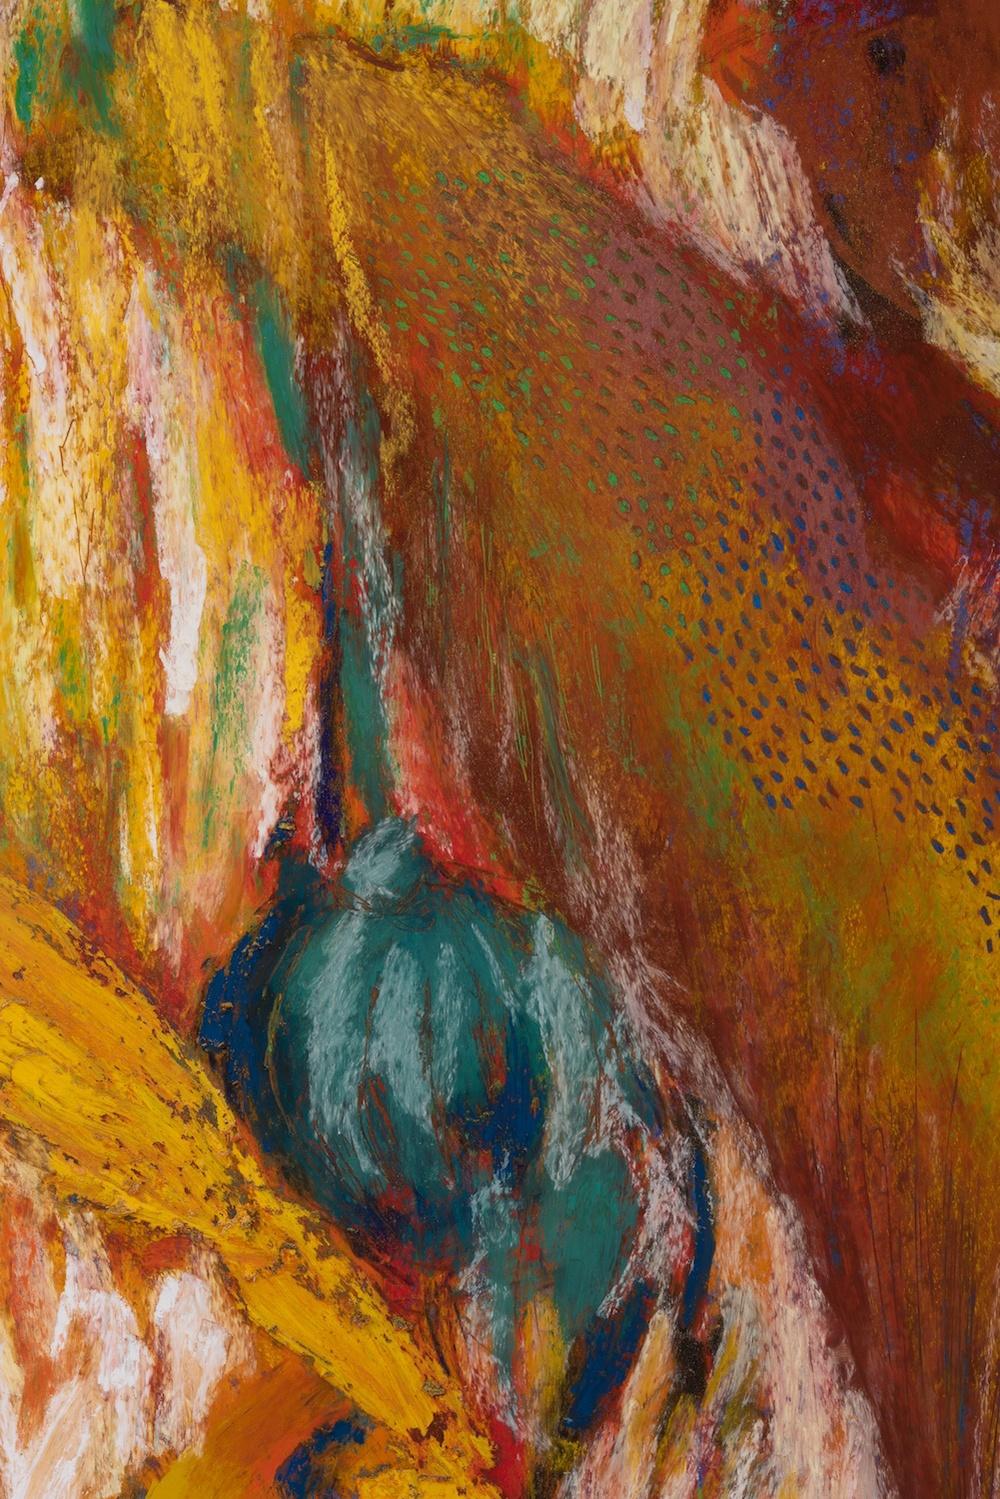 Mimi Lauter  The Conductor  (Detail) 2015 Soft pastel, oil pastel on paper 92 ¾h x 72 ¼w in (artwork); 97 ⅜h x 76 ⅞w x 3d in (framed) MLaut035